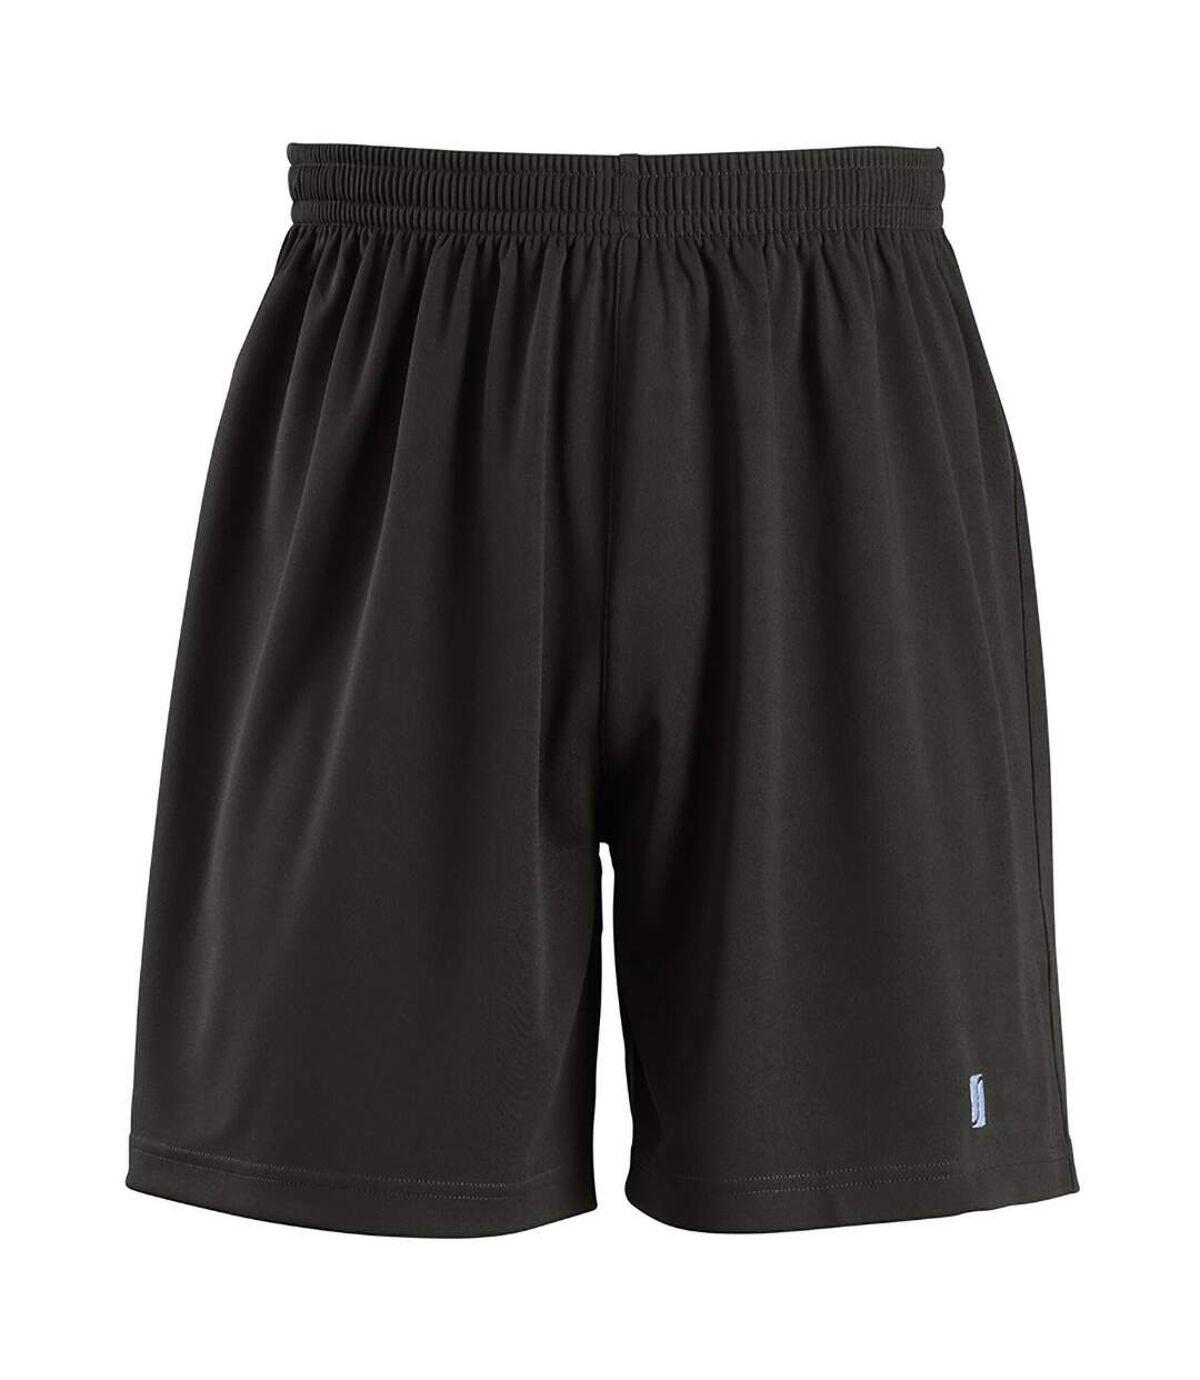 SOLS Mens San Siro 2 Sport Shorts (Black) - UTPC2177